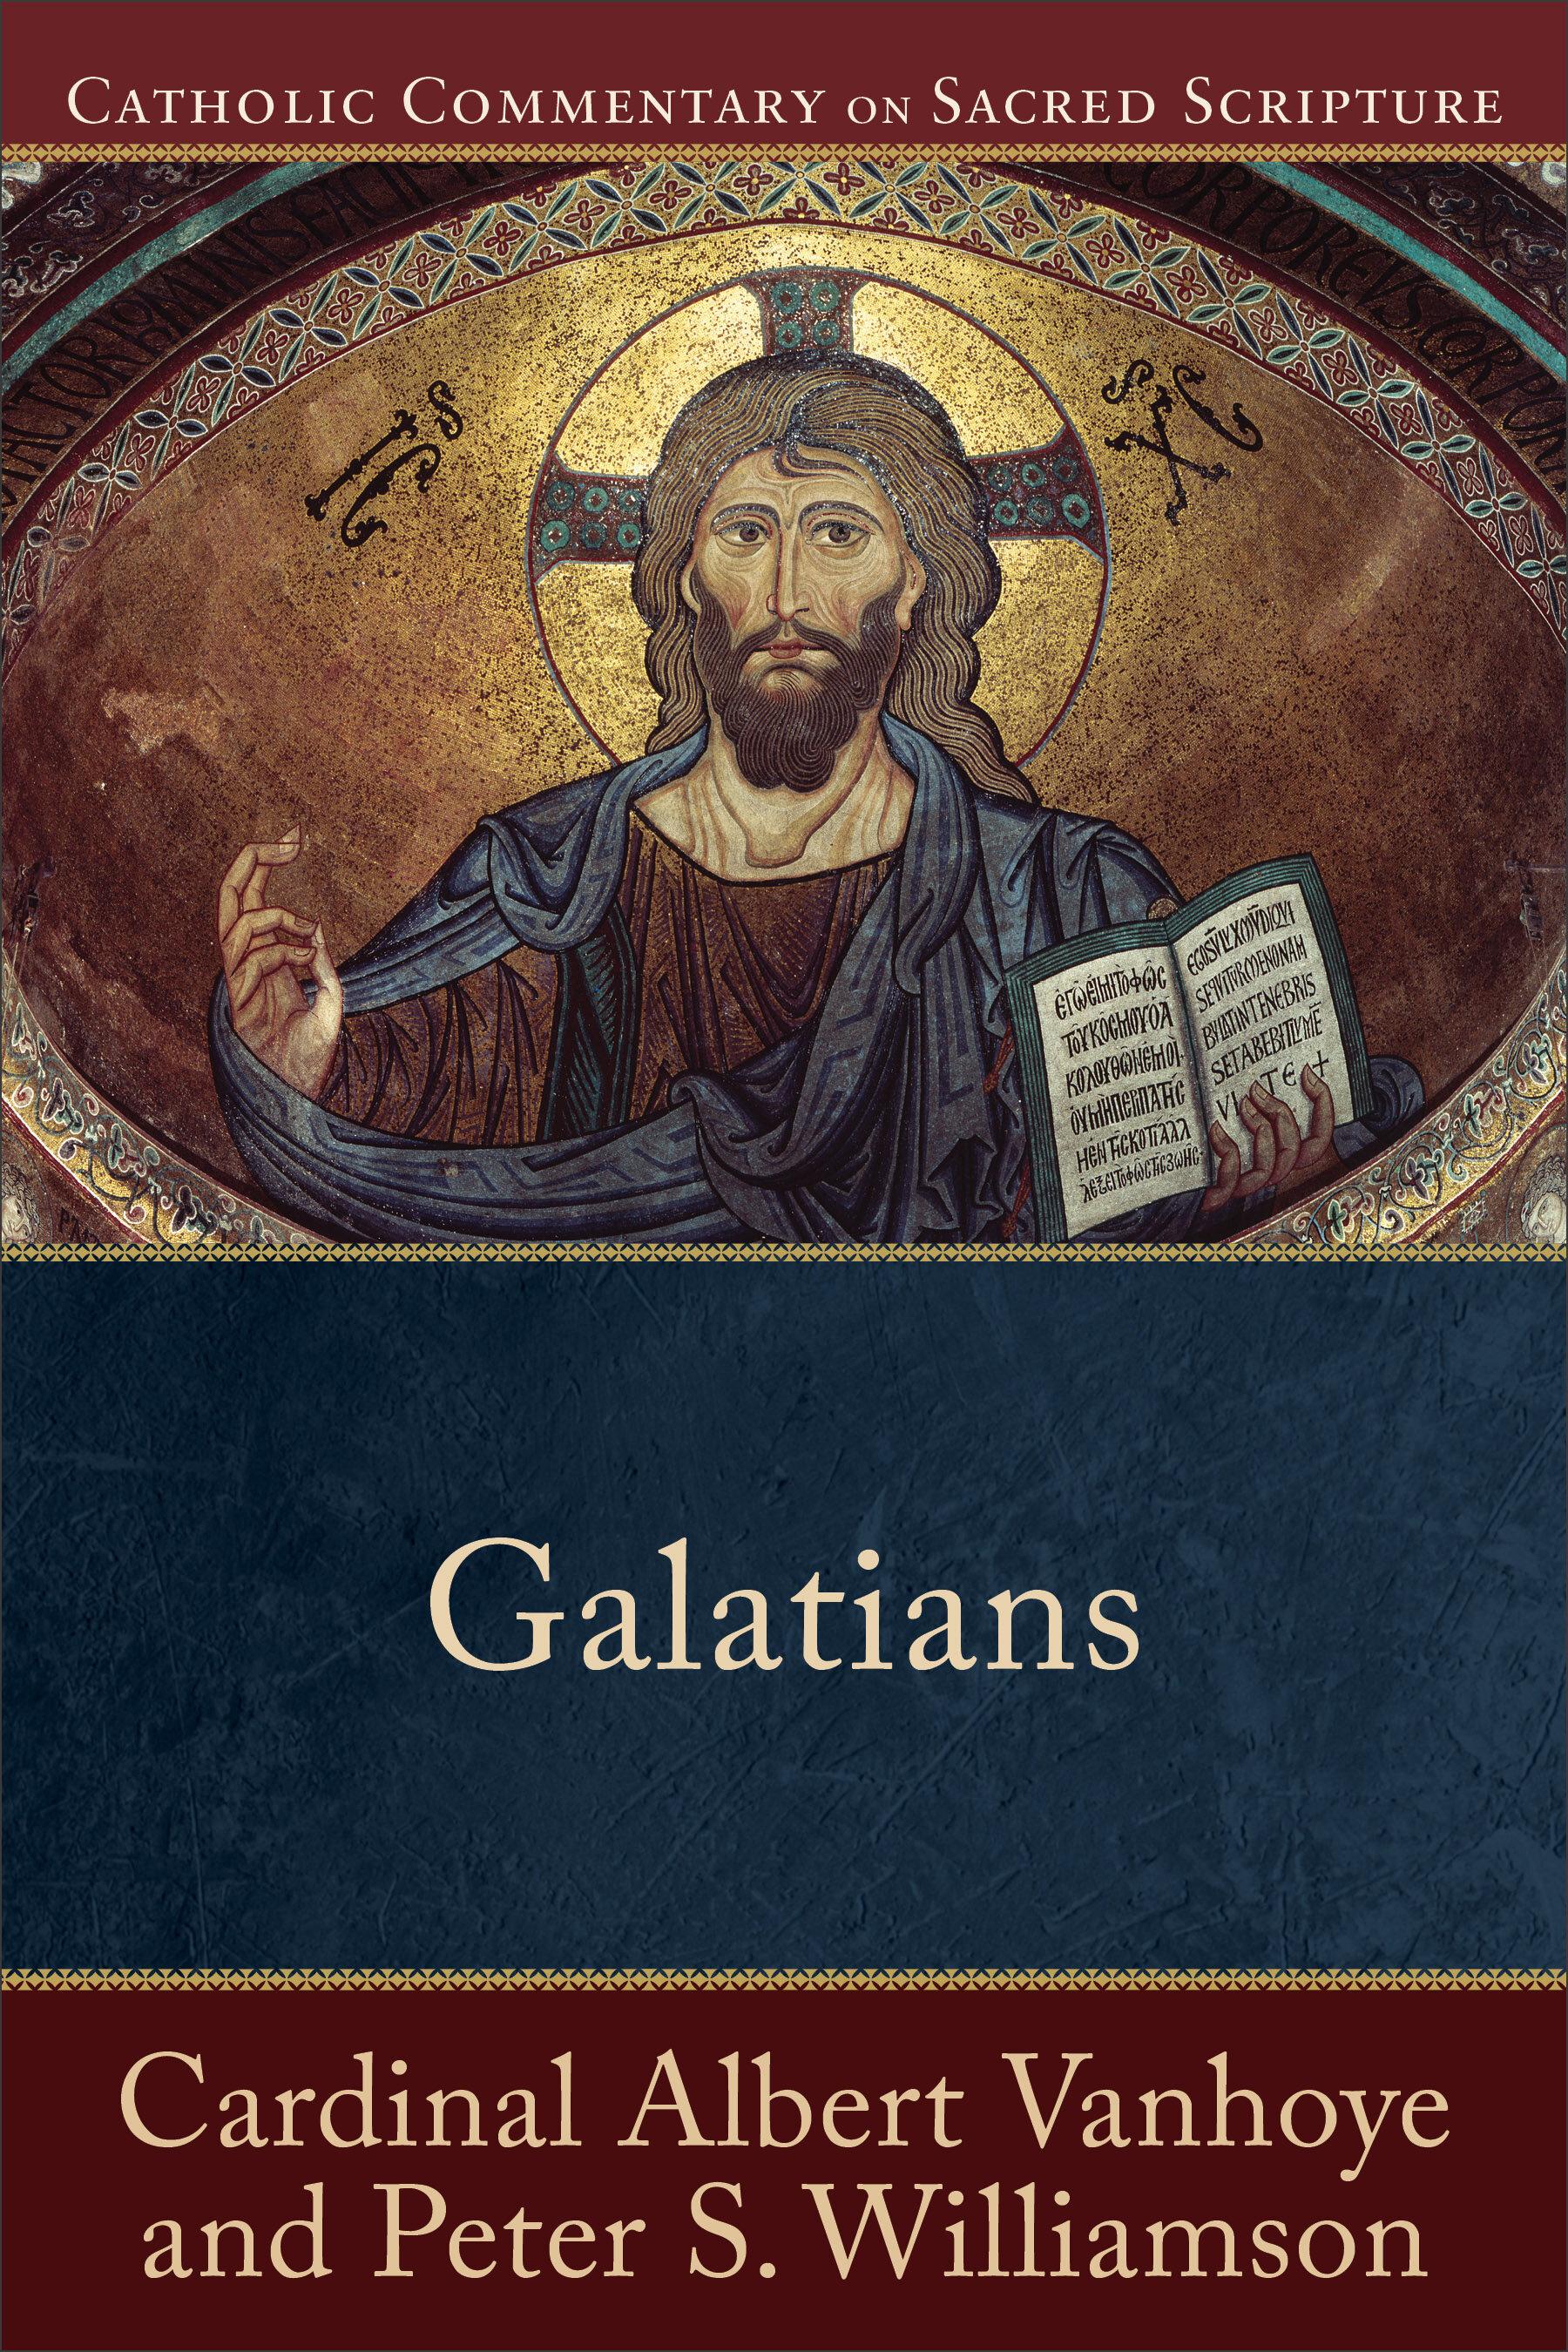 Catholic Commentary on Sacred Scripture: Galatians